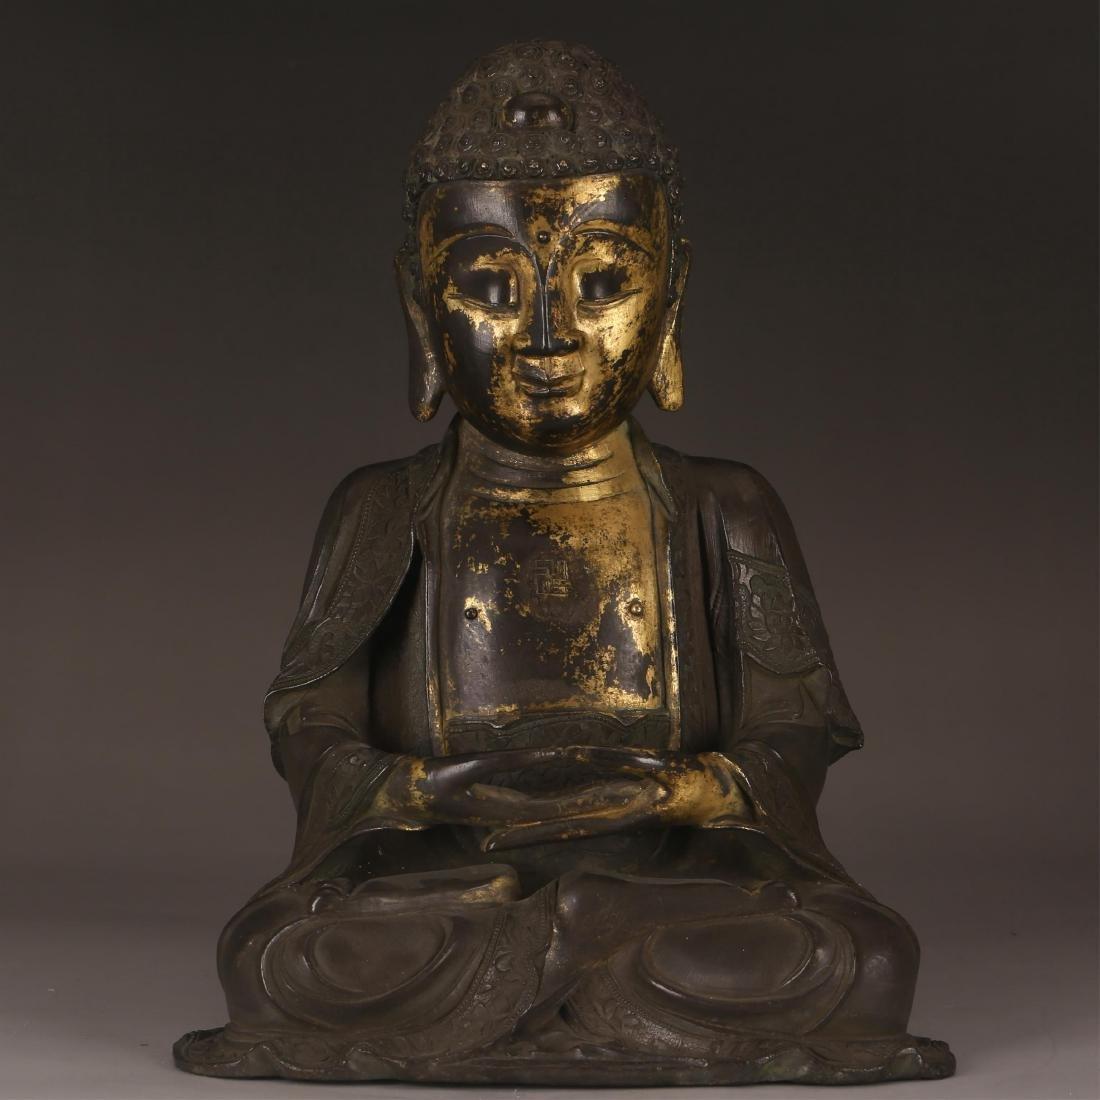 CHINESE GILT BRONZE FIGURE OF BUDDHA, QING DYNASTY